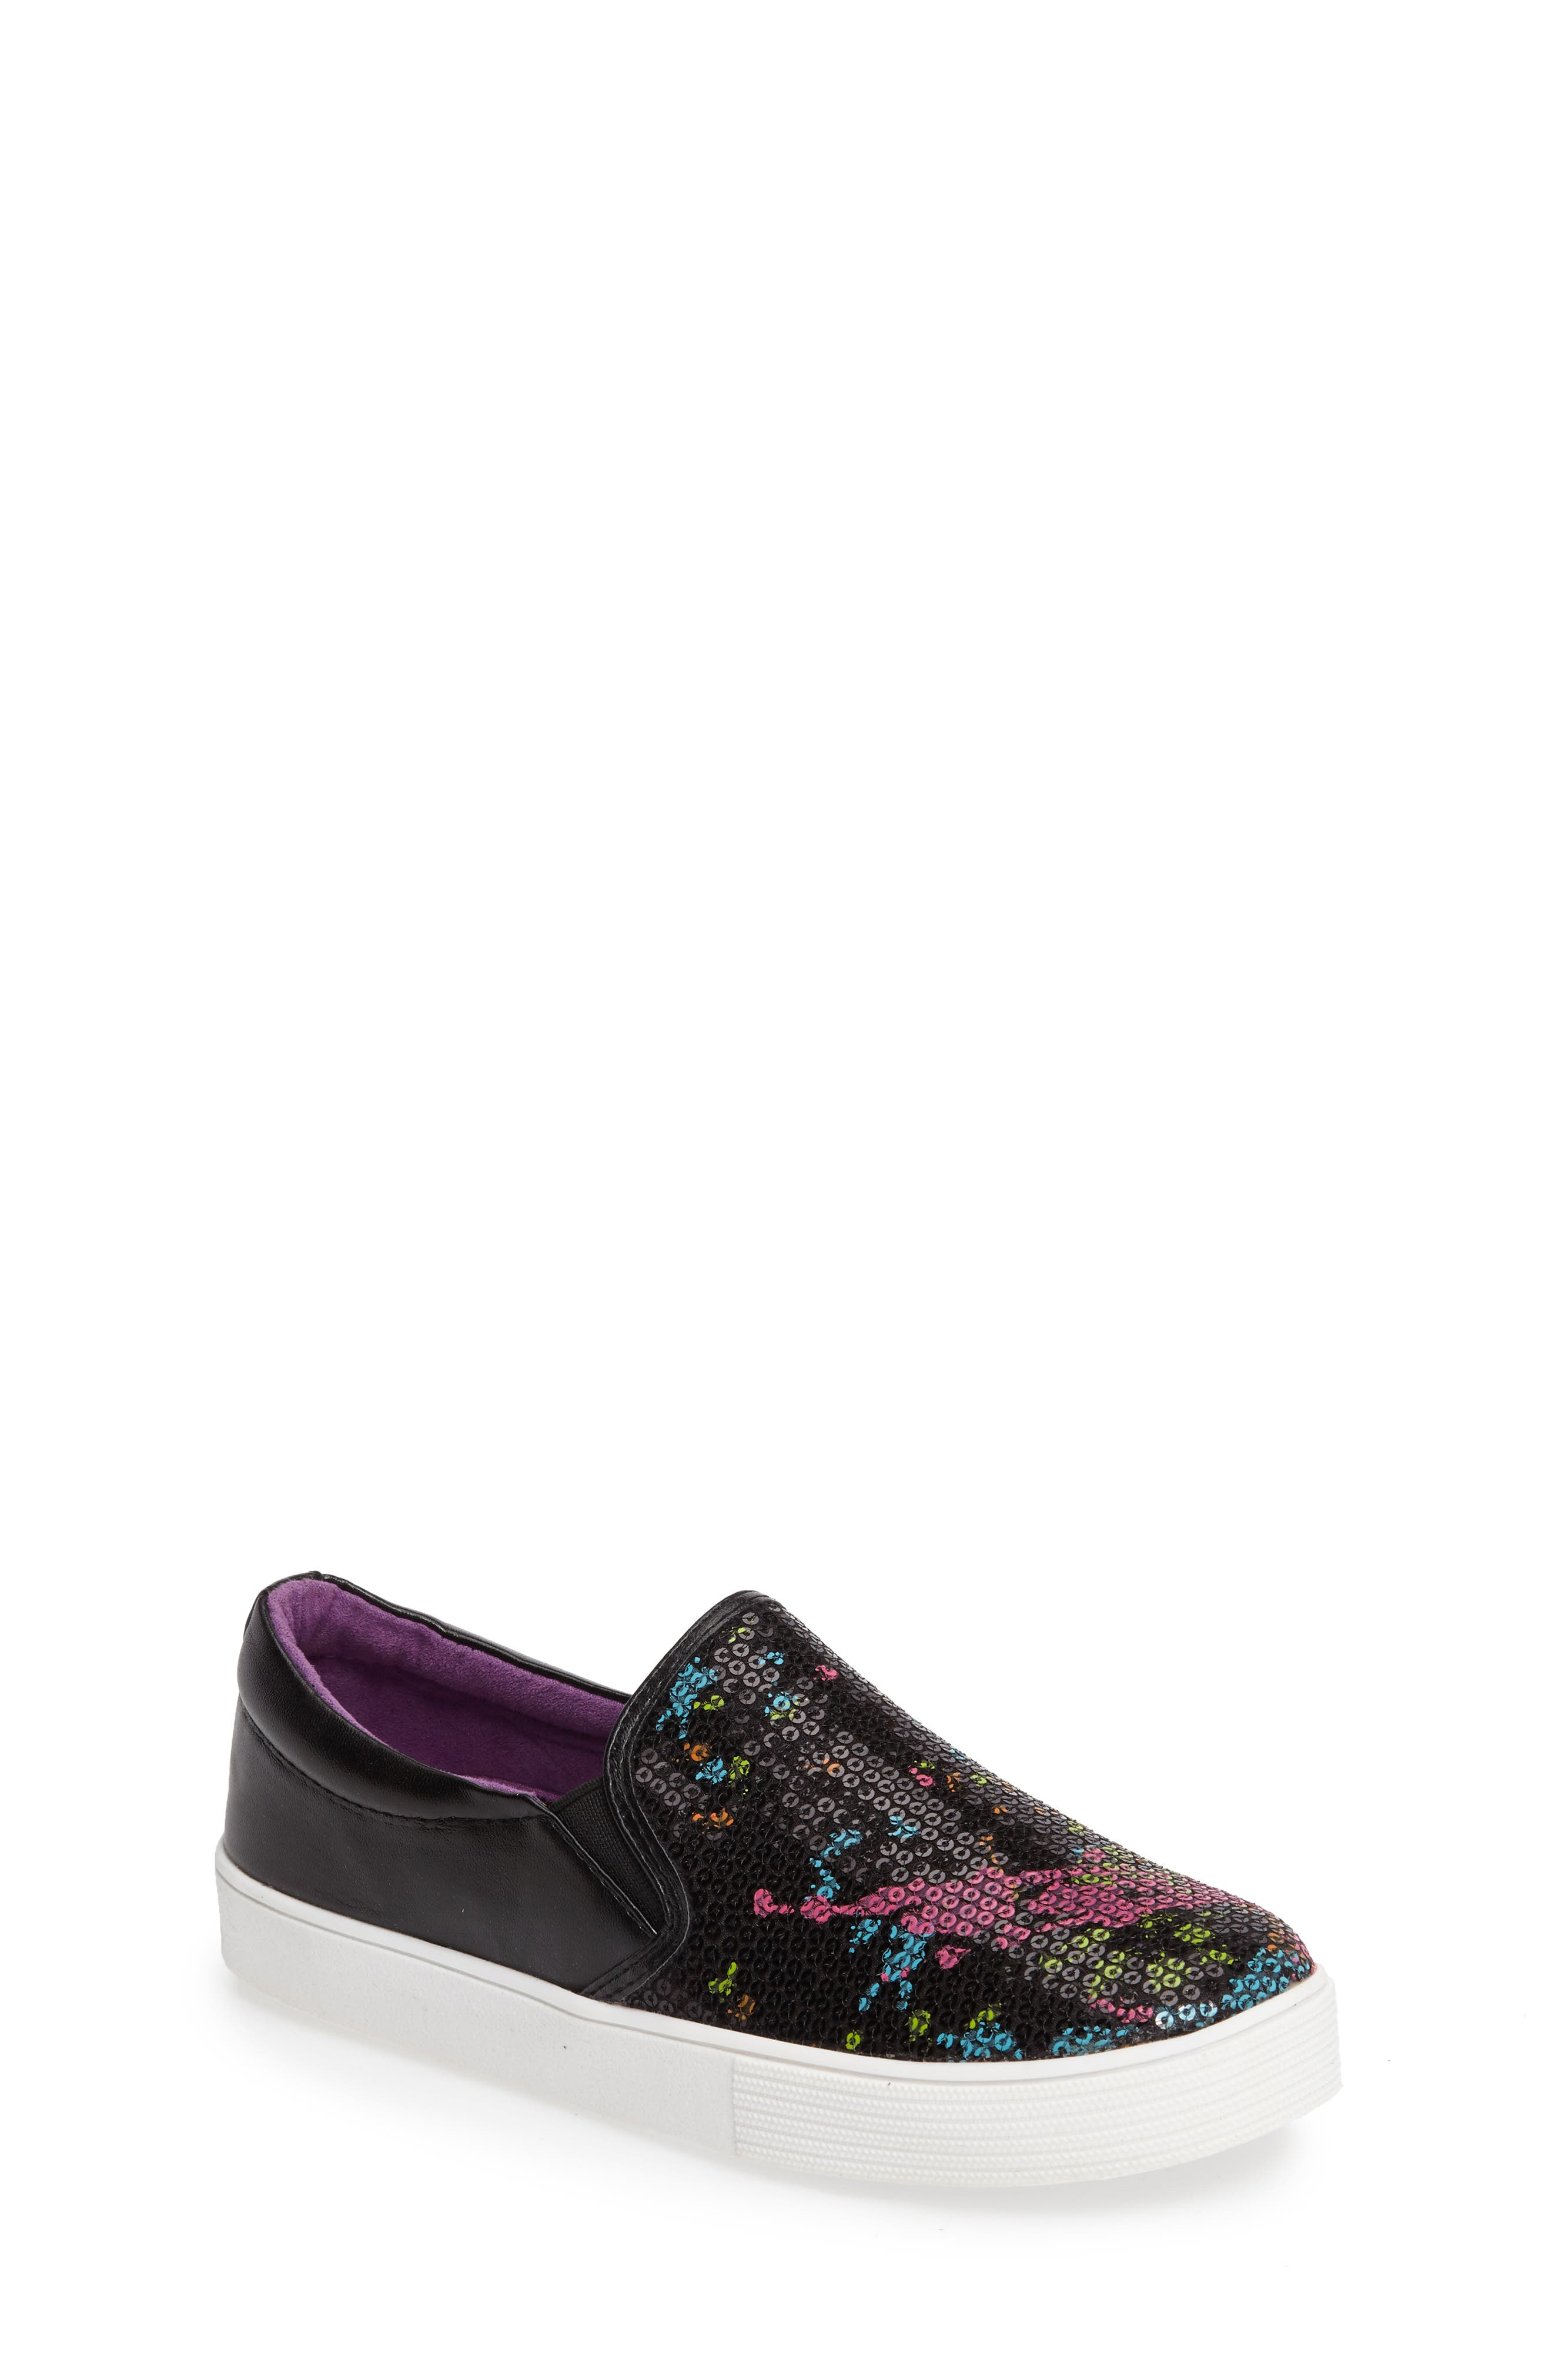 Kam Paint Slip-On Sneaker,                             Main thumbnail 1, color,                             001